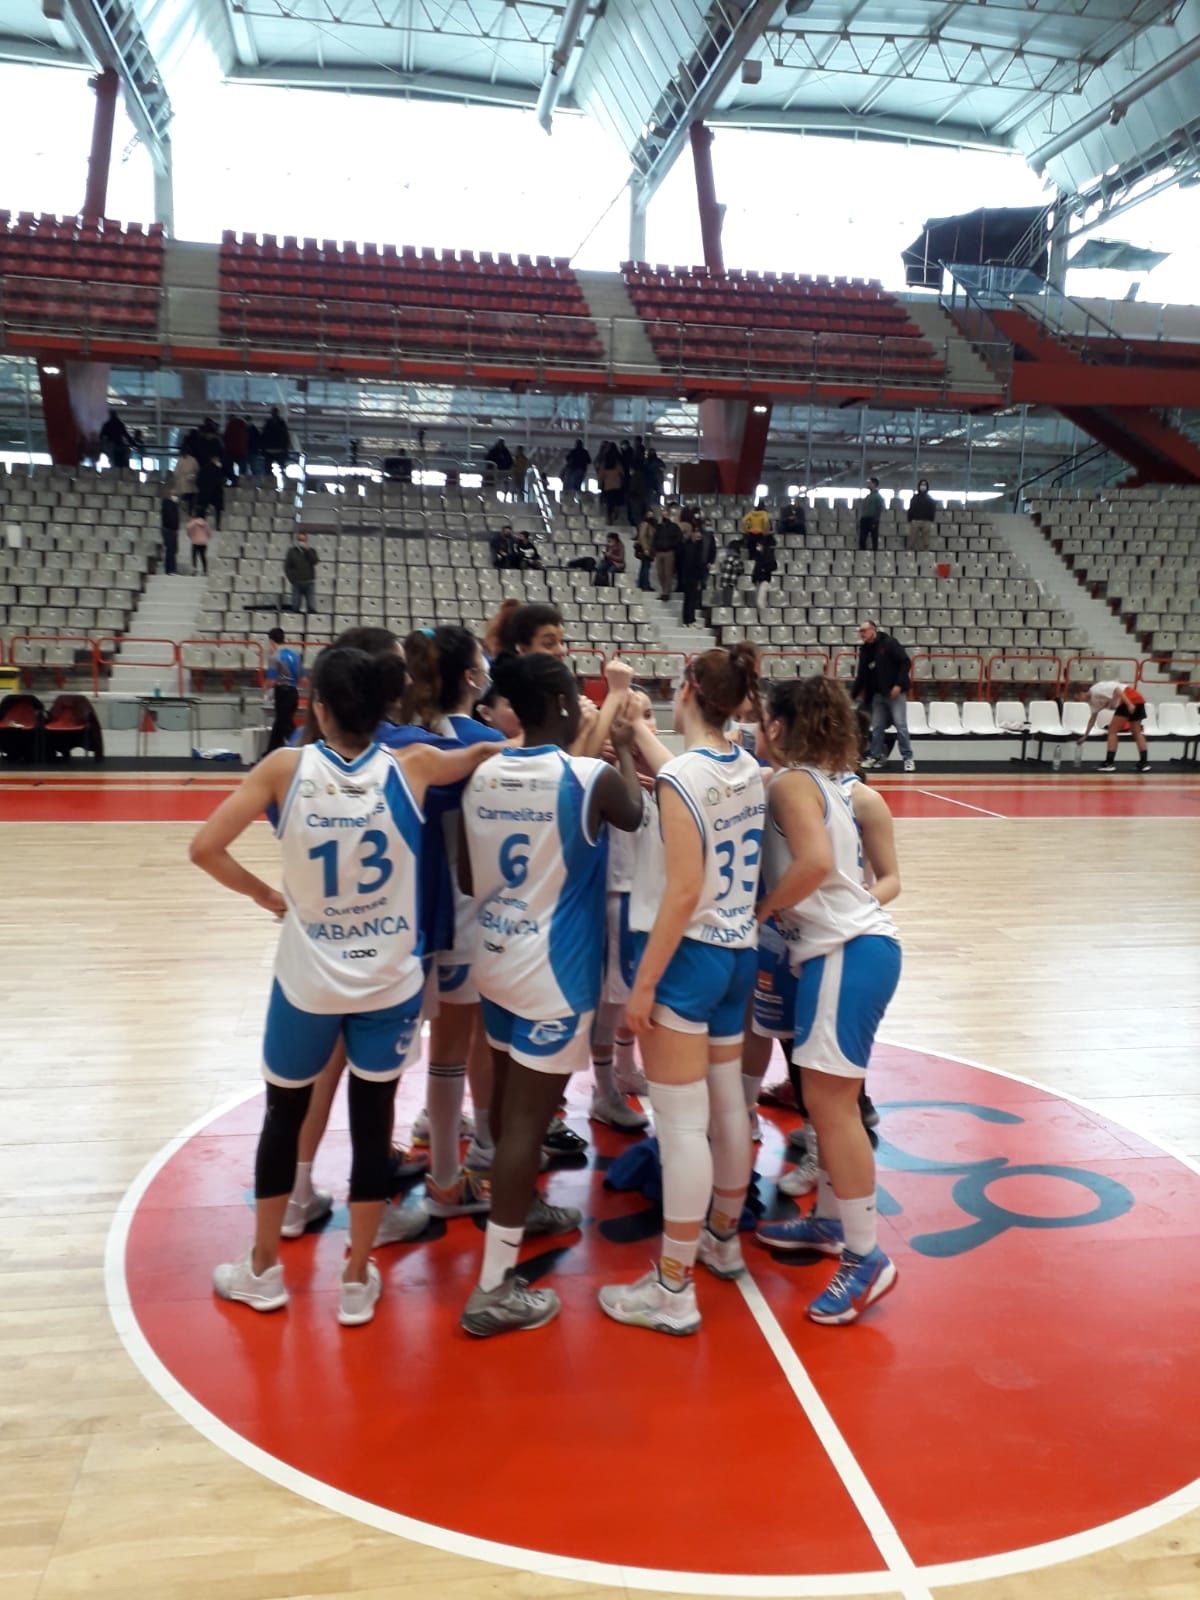 1ª Div. Nacional: Fodeba Gijón vs Codigalco Carmelitas: 49-66